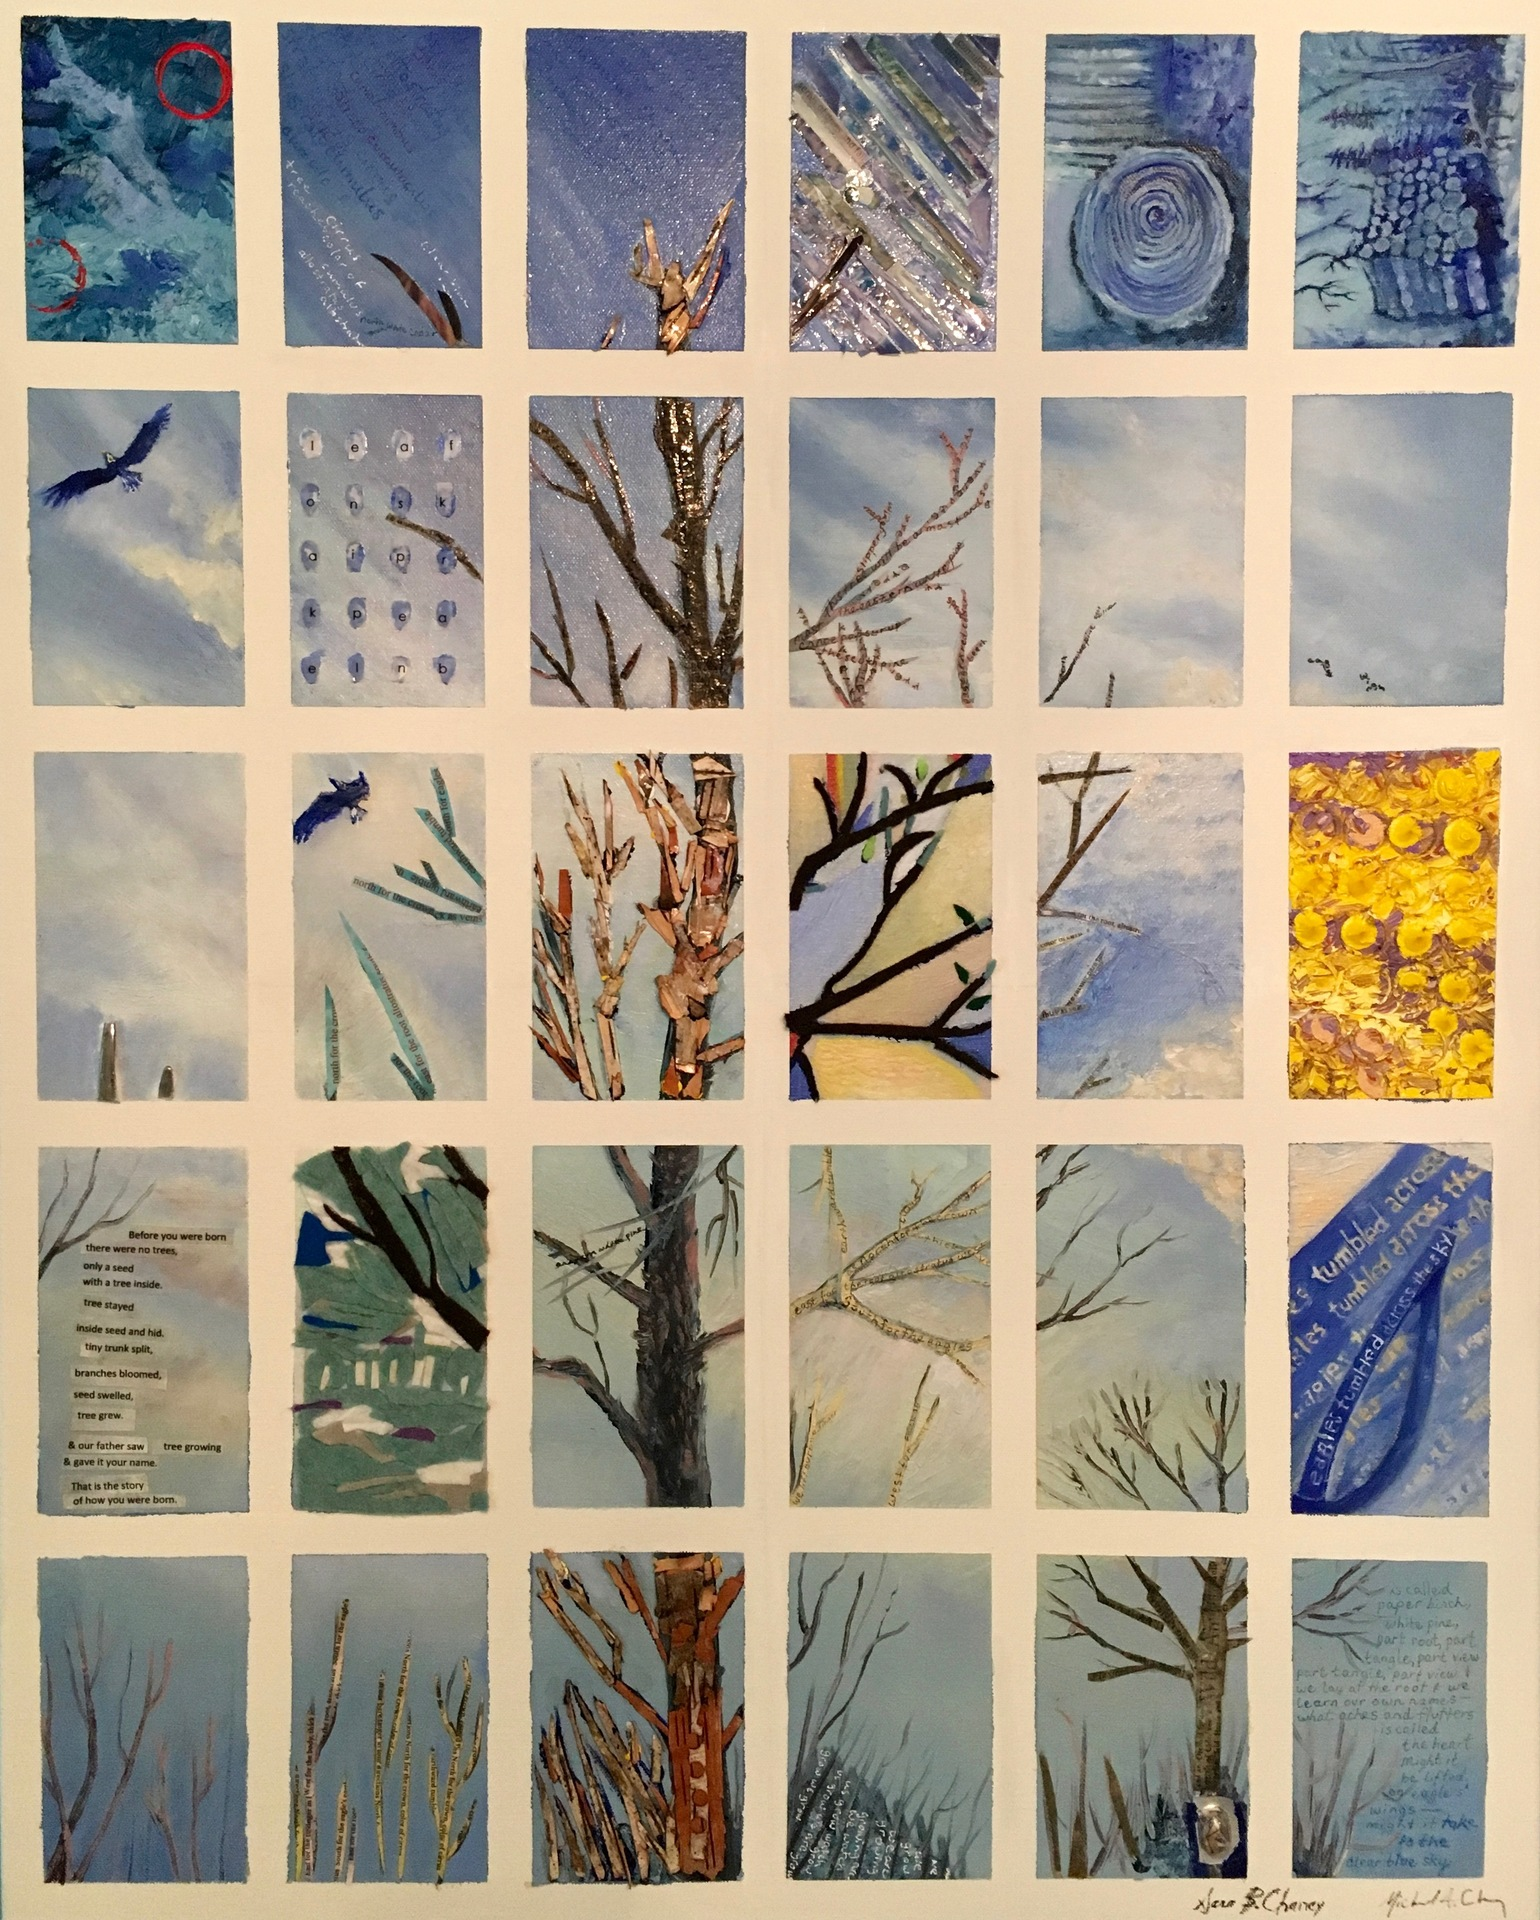 MICHAEL AND SARA CHANEY  - White River Junction, NY   Almanac #7 Tree   mixed media, $1,500